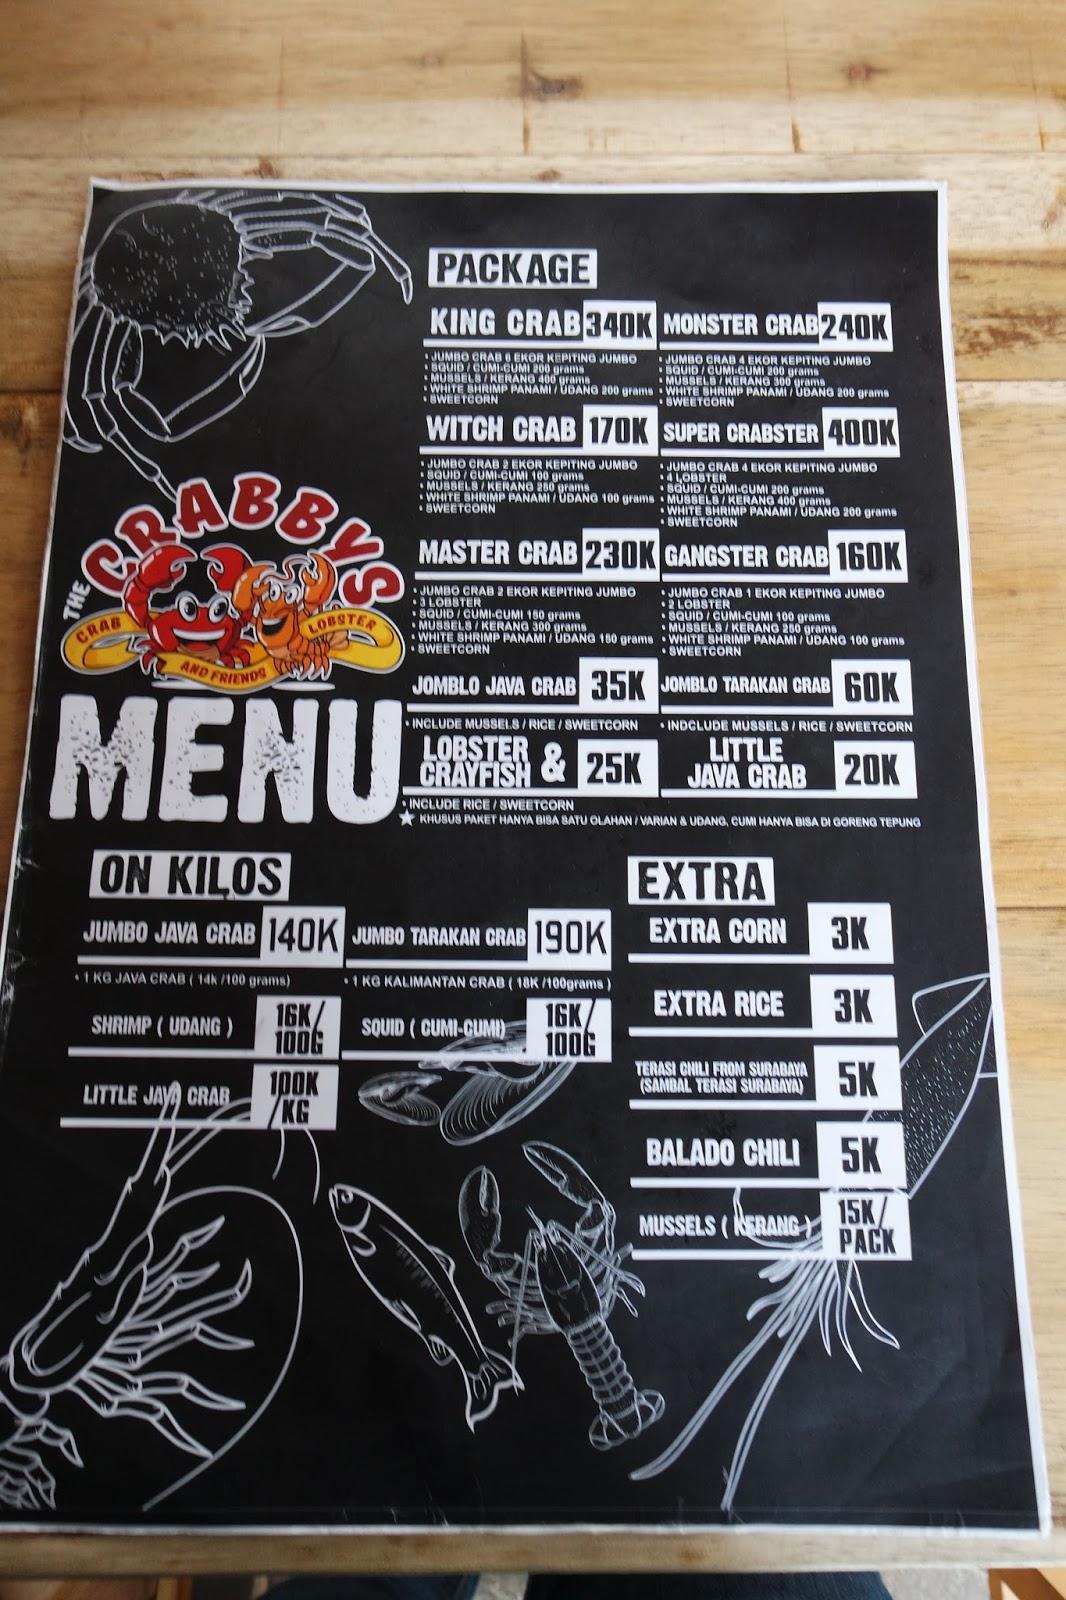 The Crabbys Kepiting Jogja Meira Oka